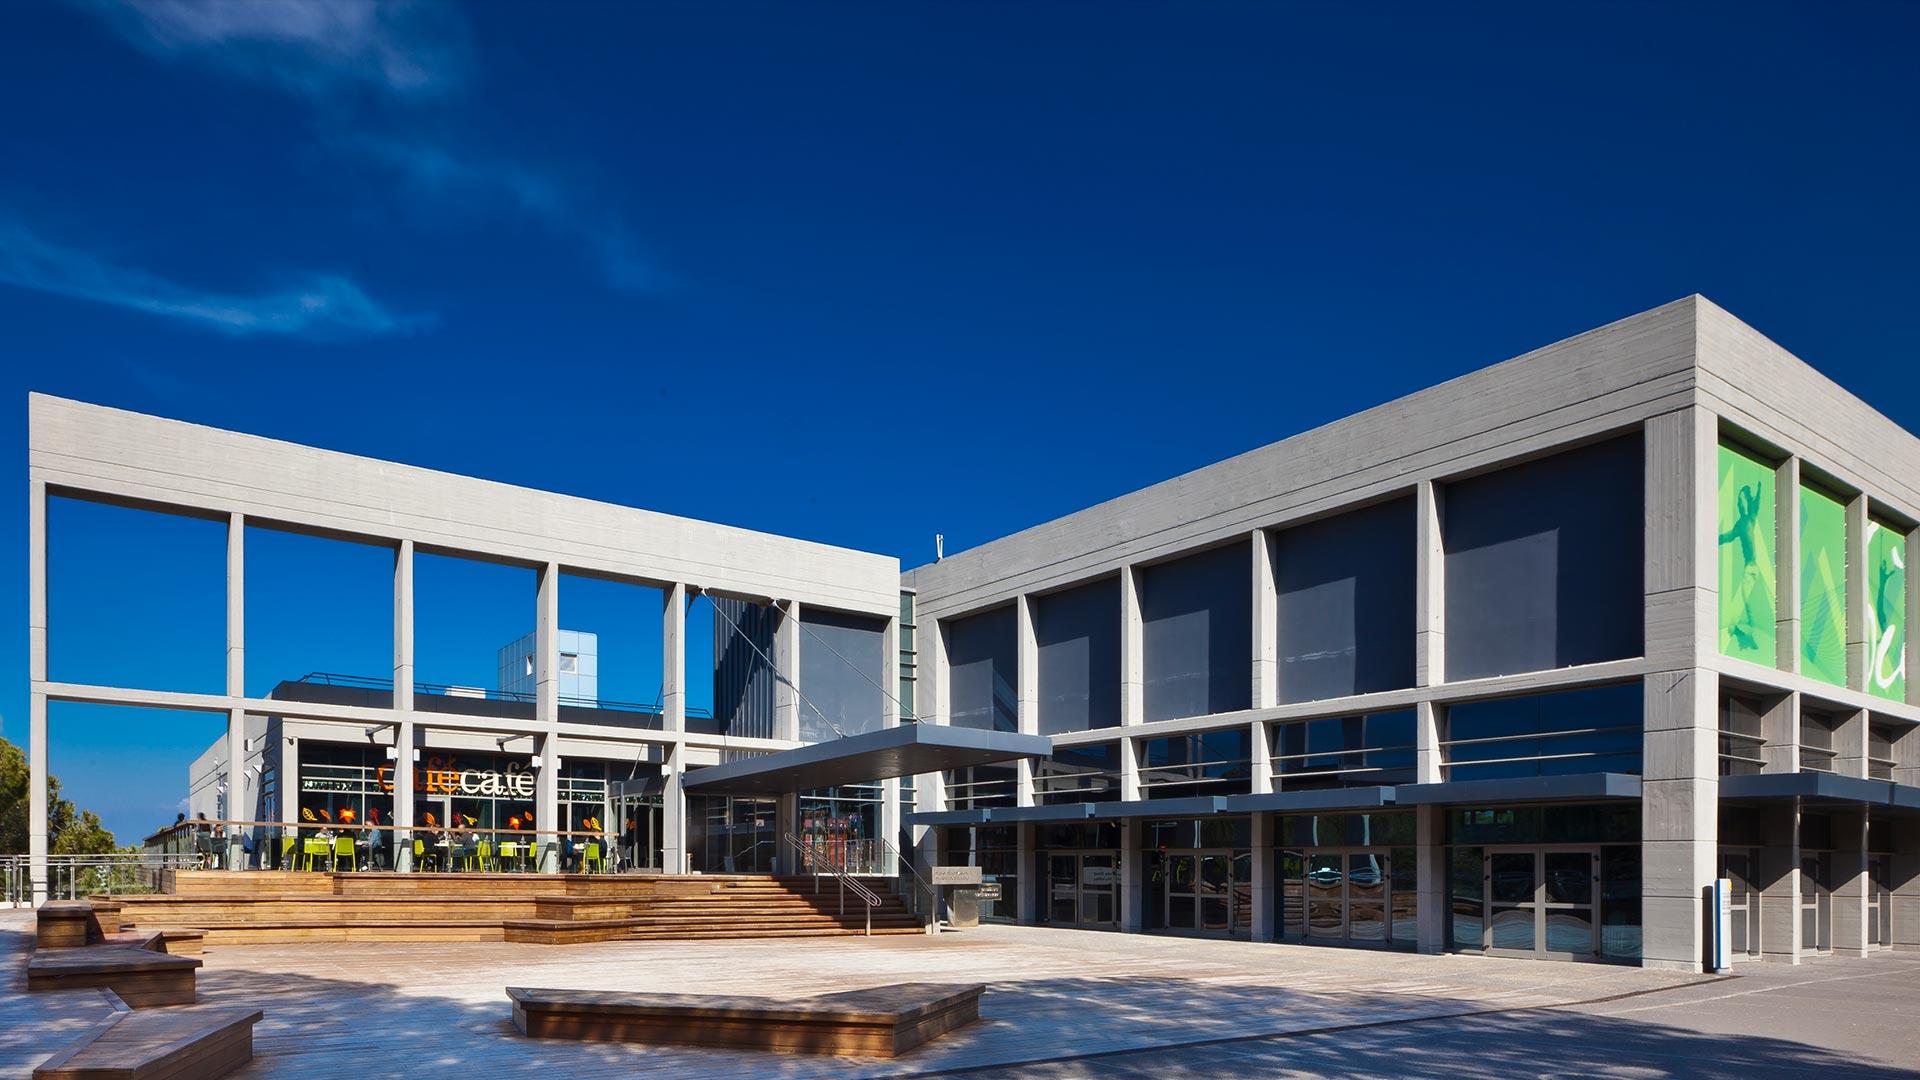 Stanley Shalom Zielony Student Union Building – Technion - Haifa